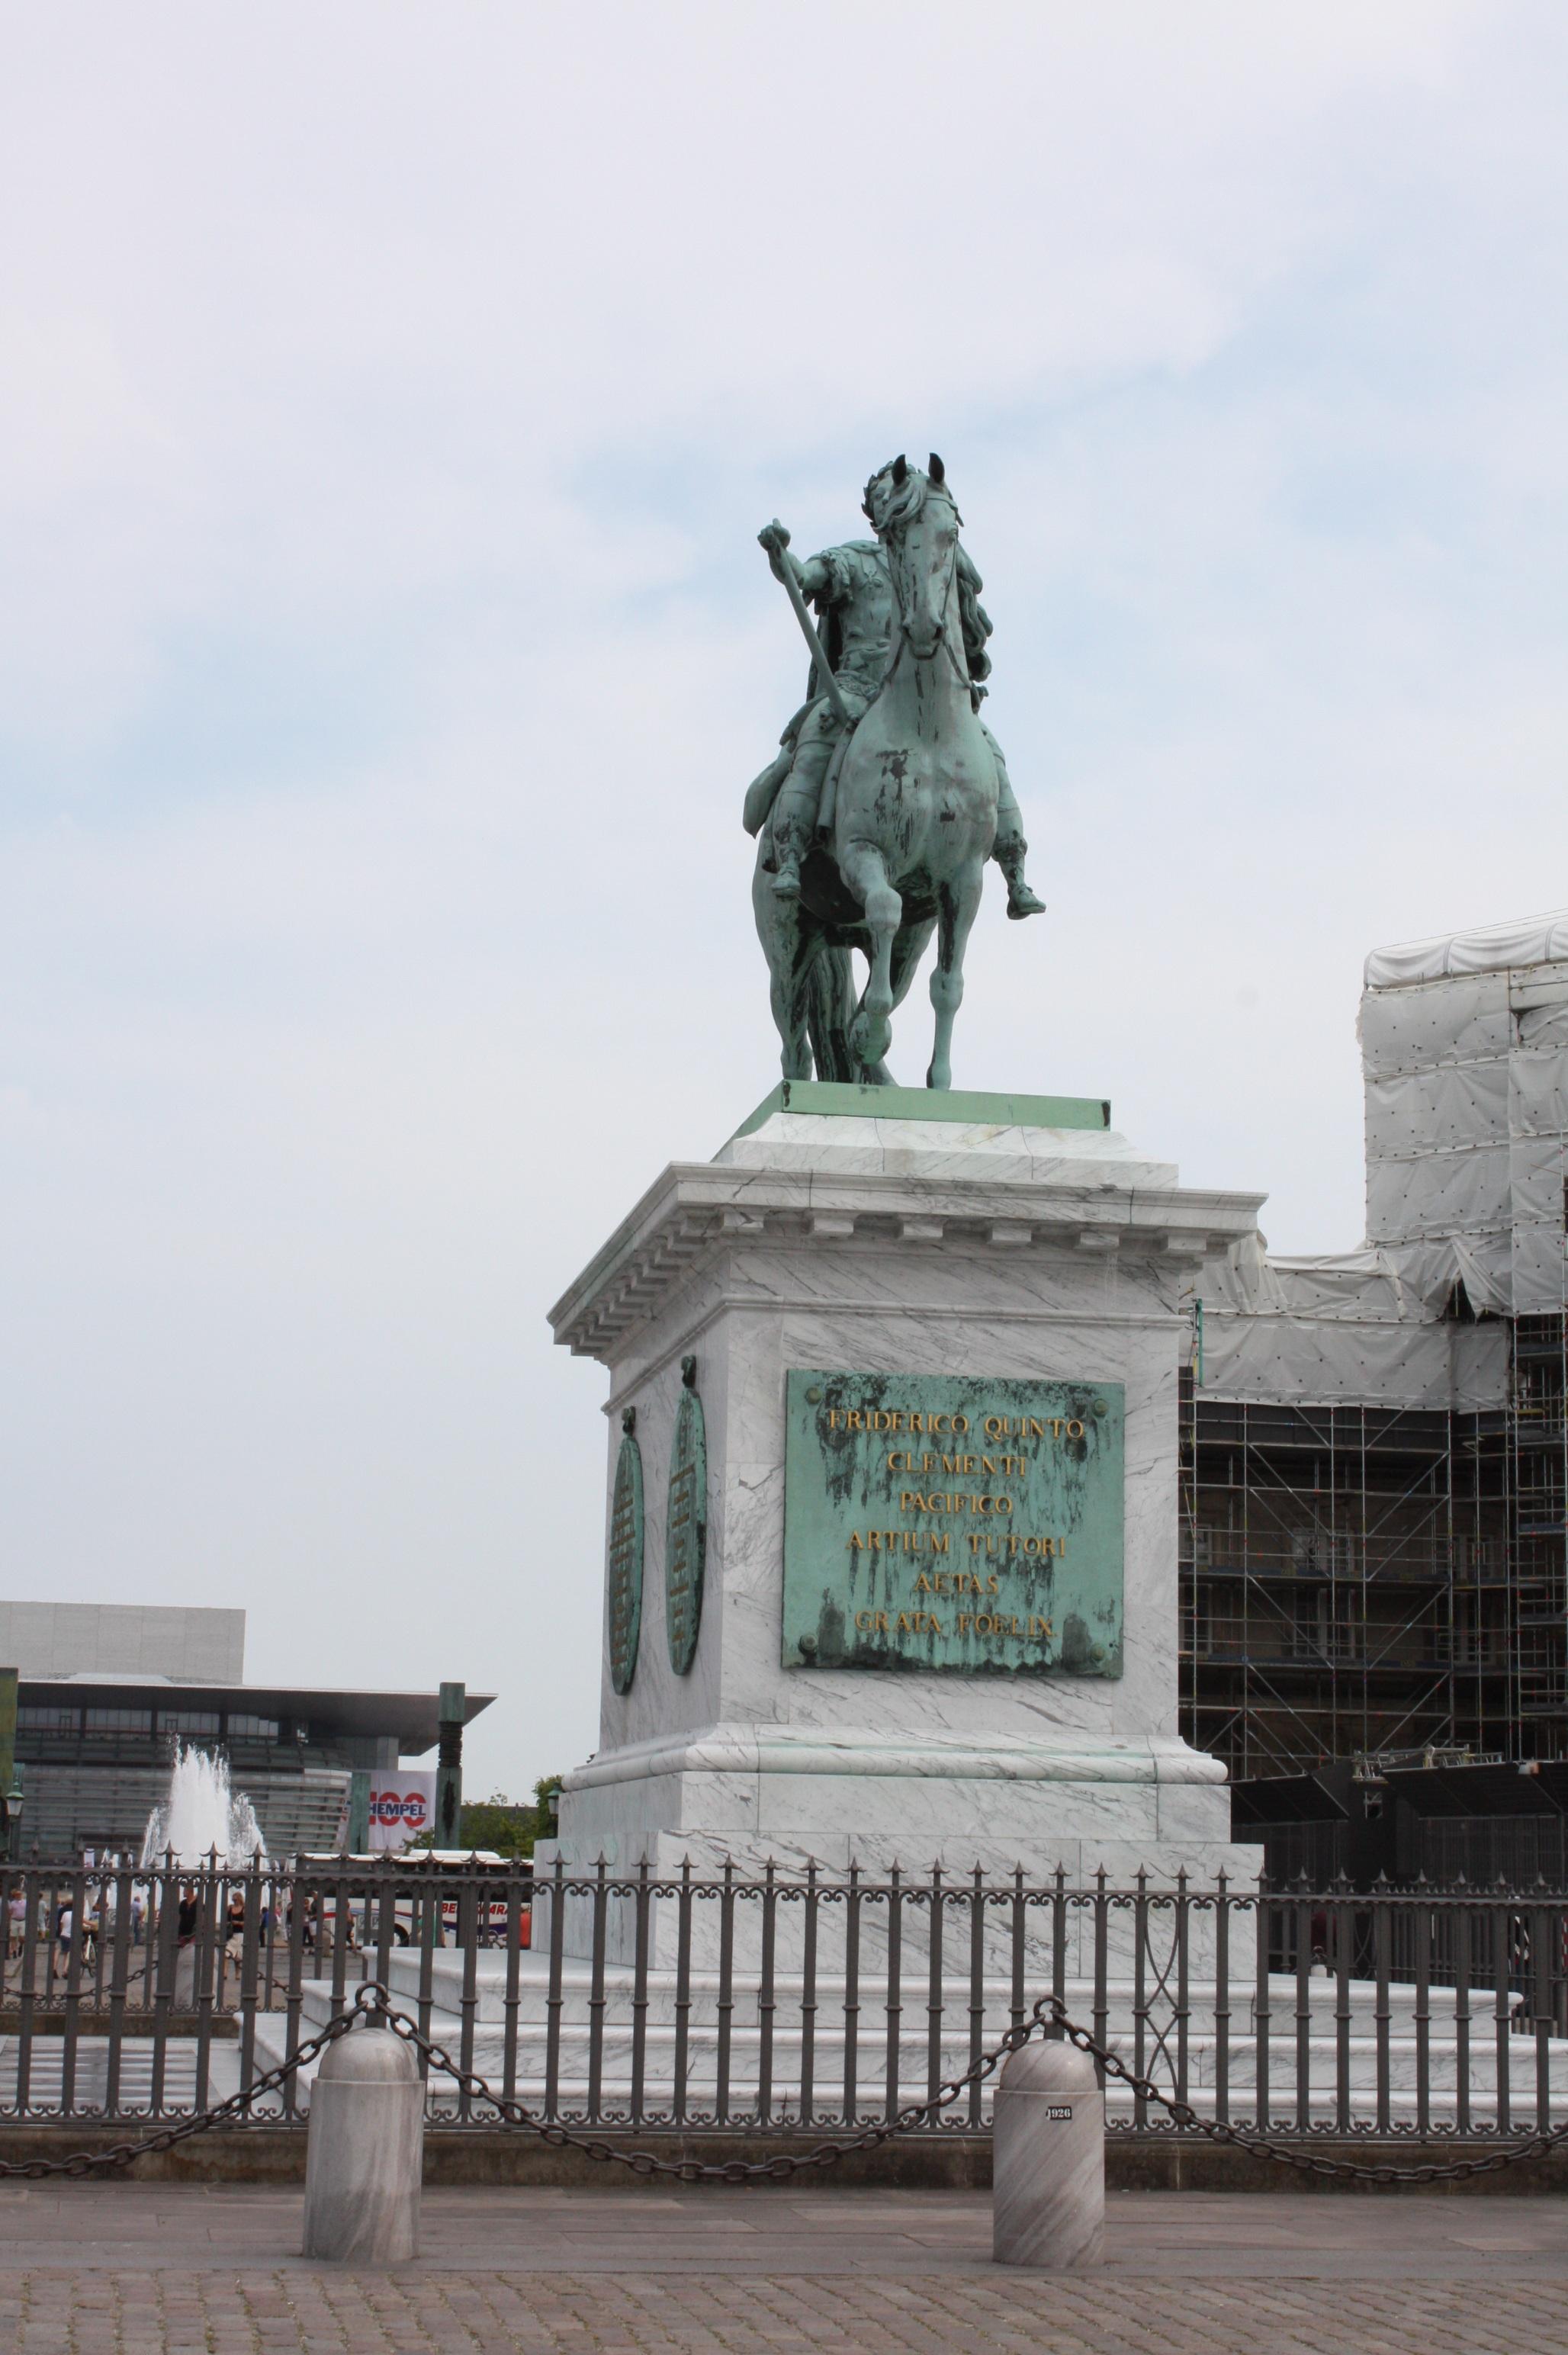 Fotos gratis : Monumento, estatua, punto de referencia